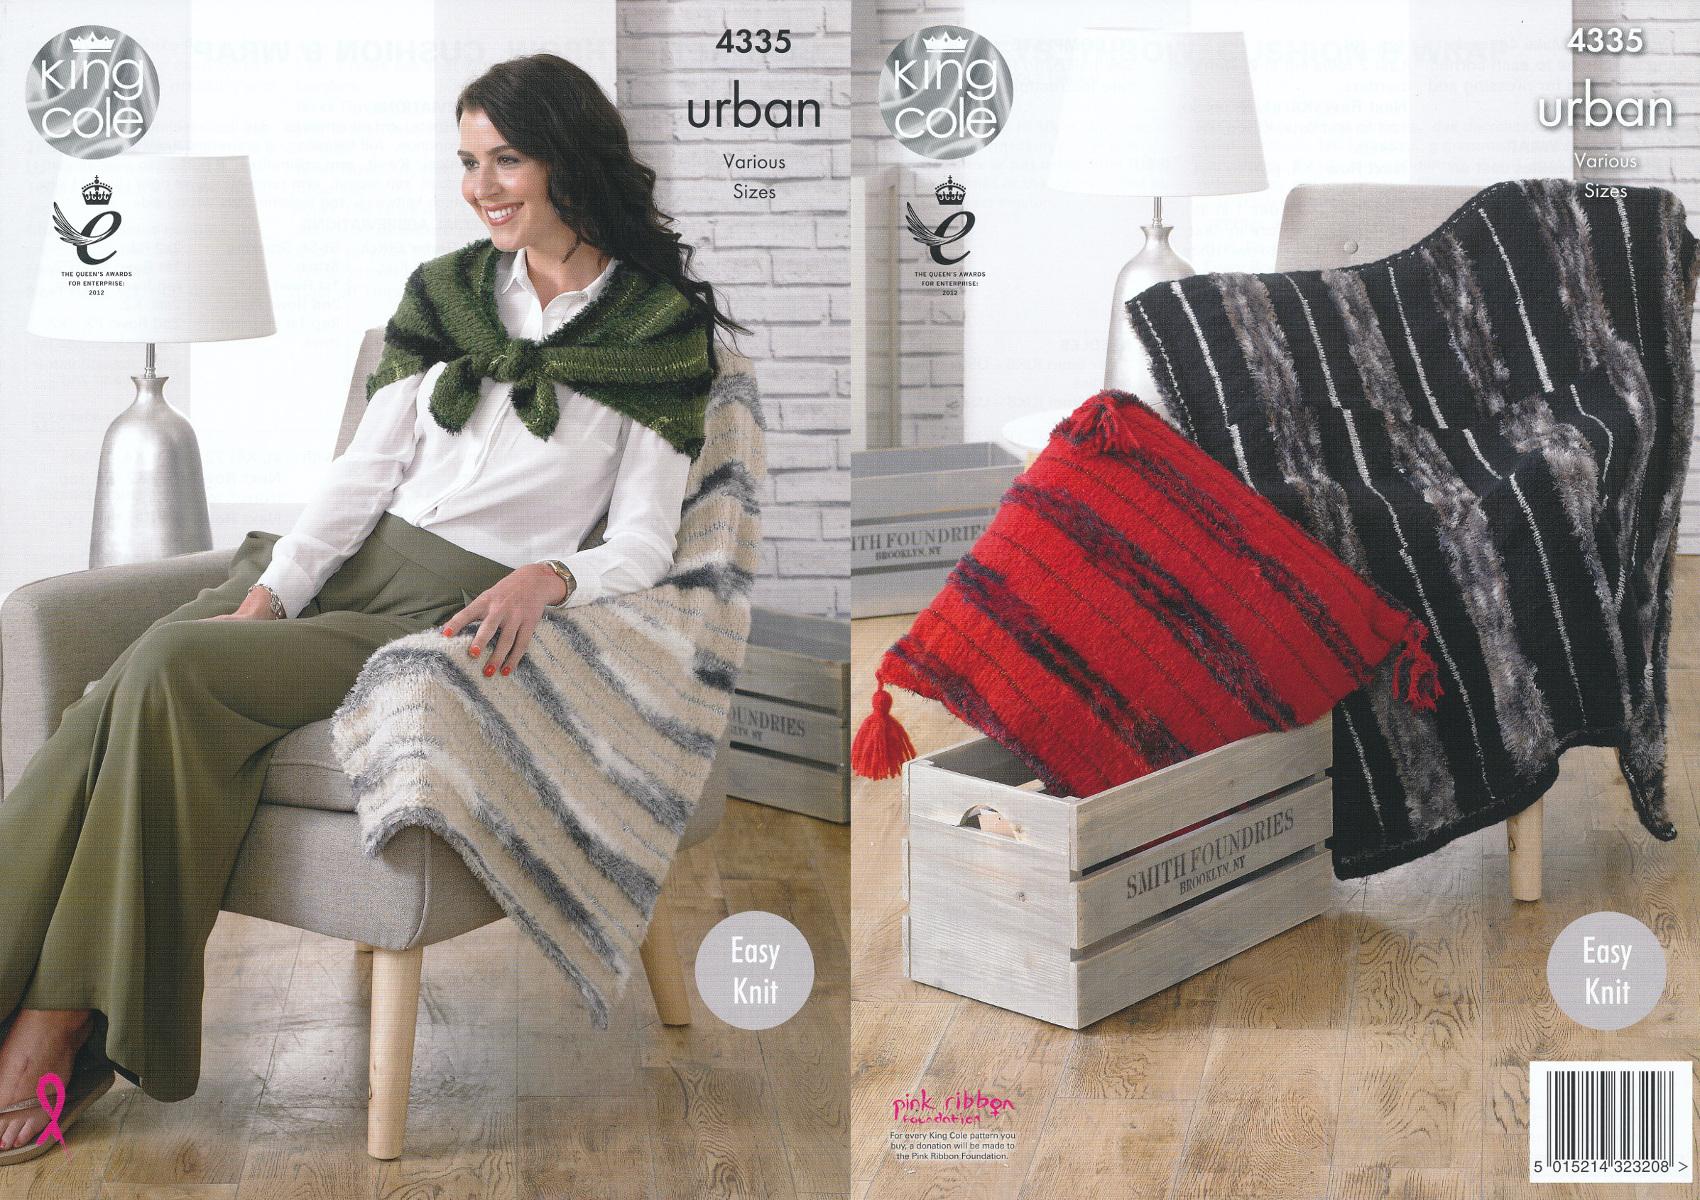 King Cole Urban Knitting Pattern Throw Blankets Cushion & Wrap Easy Knit ...